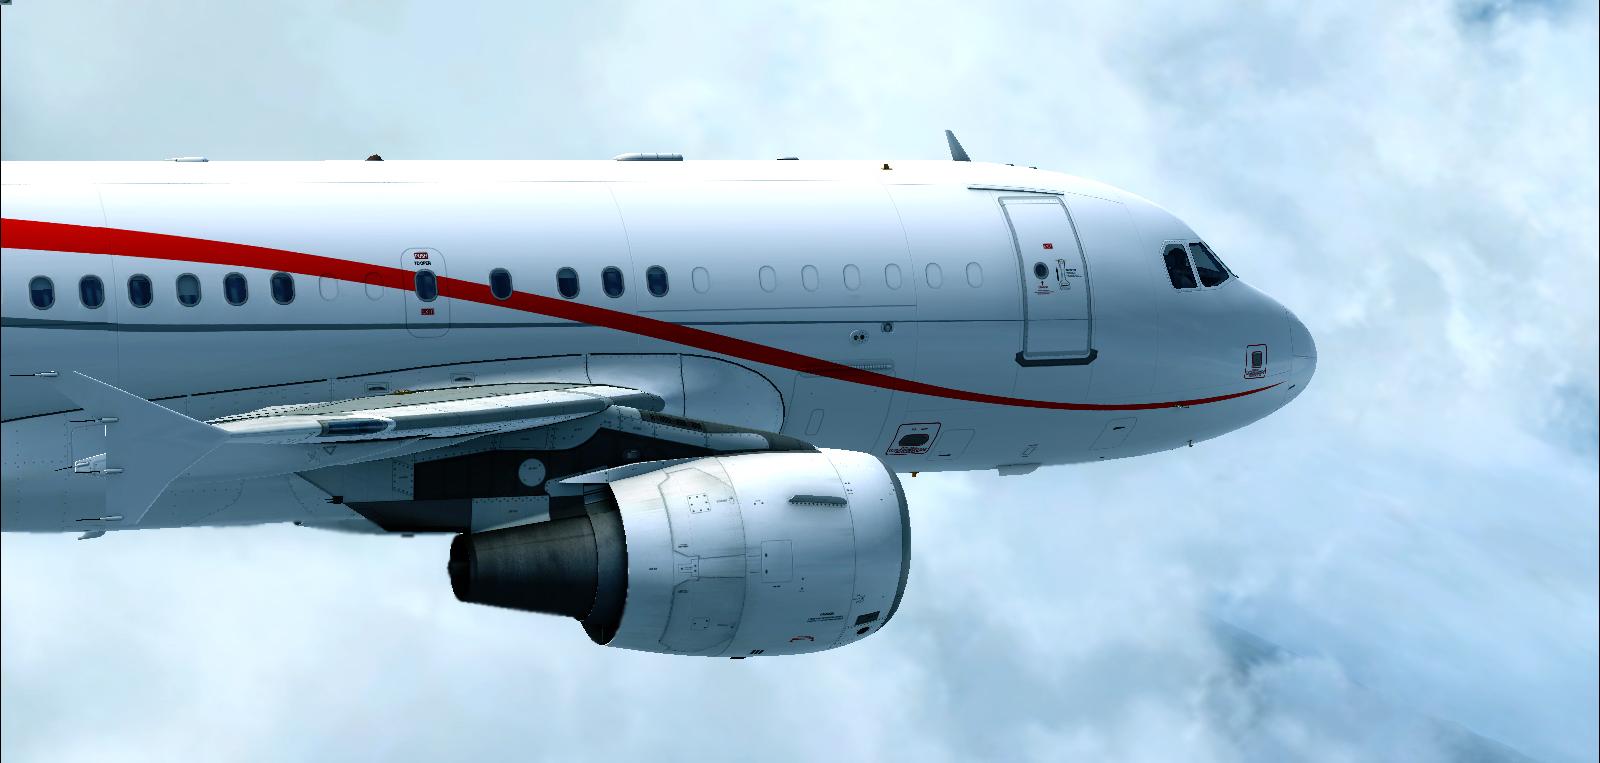 SimCatalog - Aerosoft A318/A318 updated to 1 1